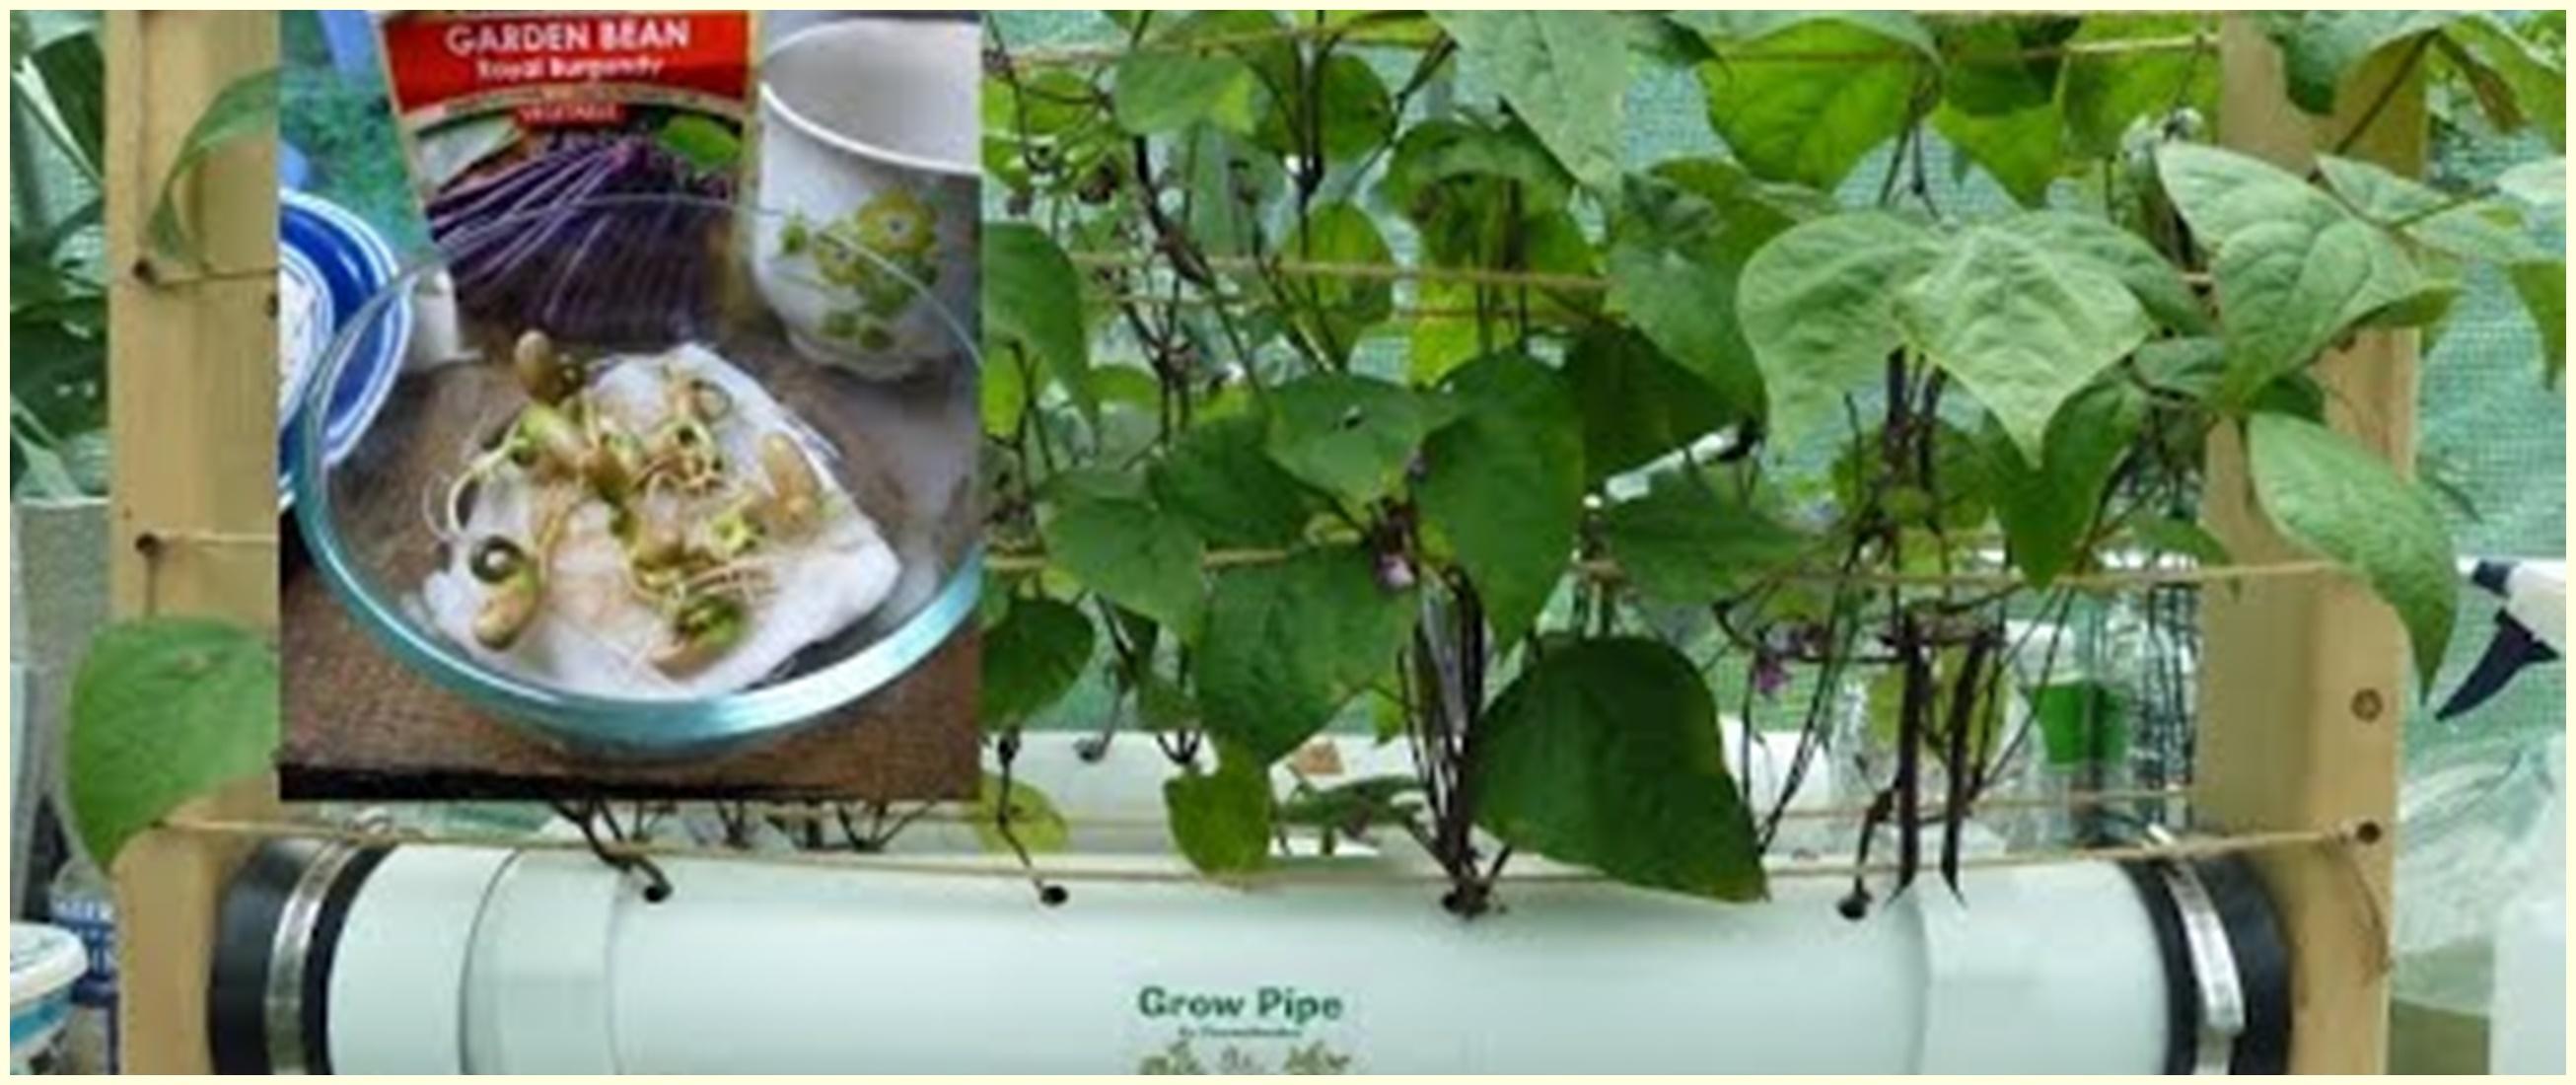 Cara menanam hidroponik kacang hijau, mudah dan sederhana